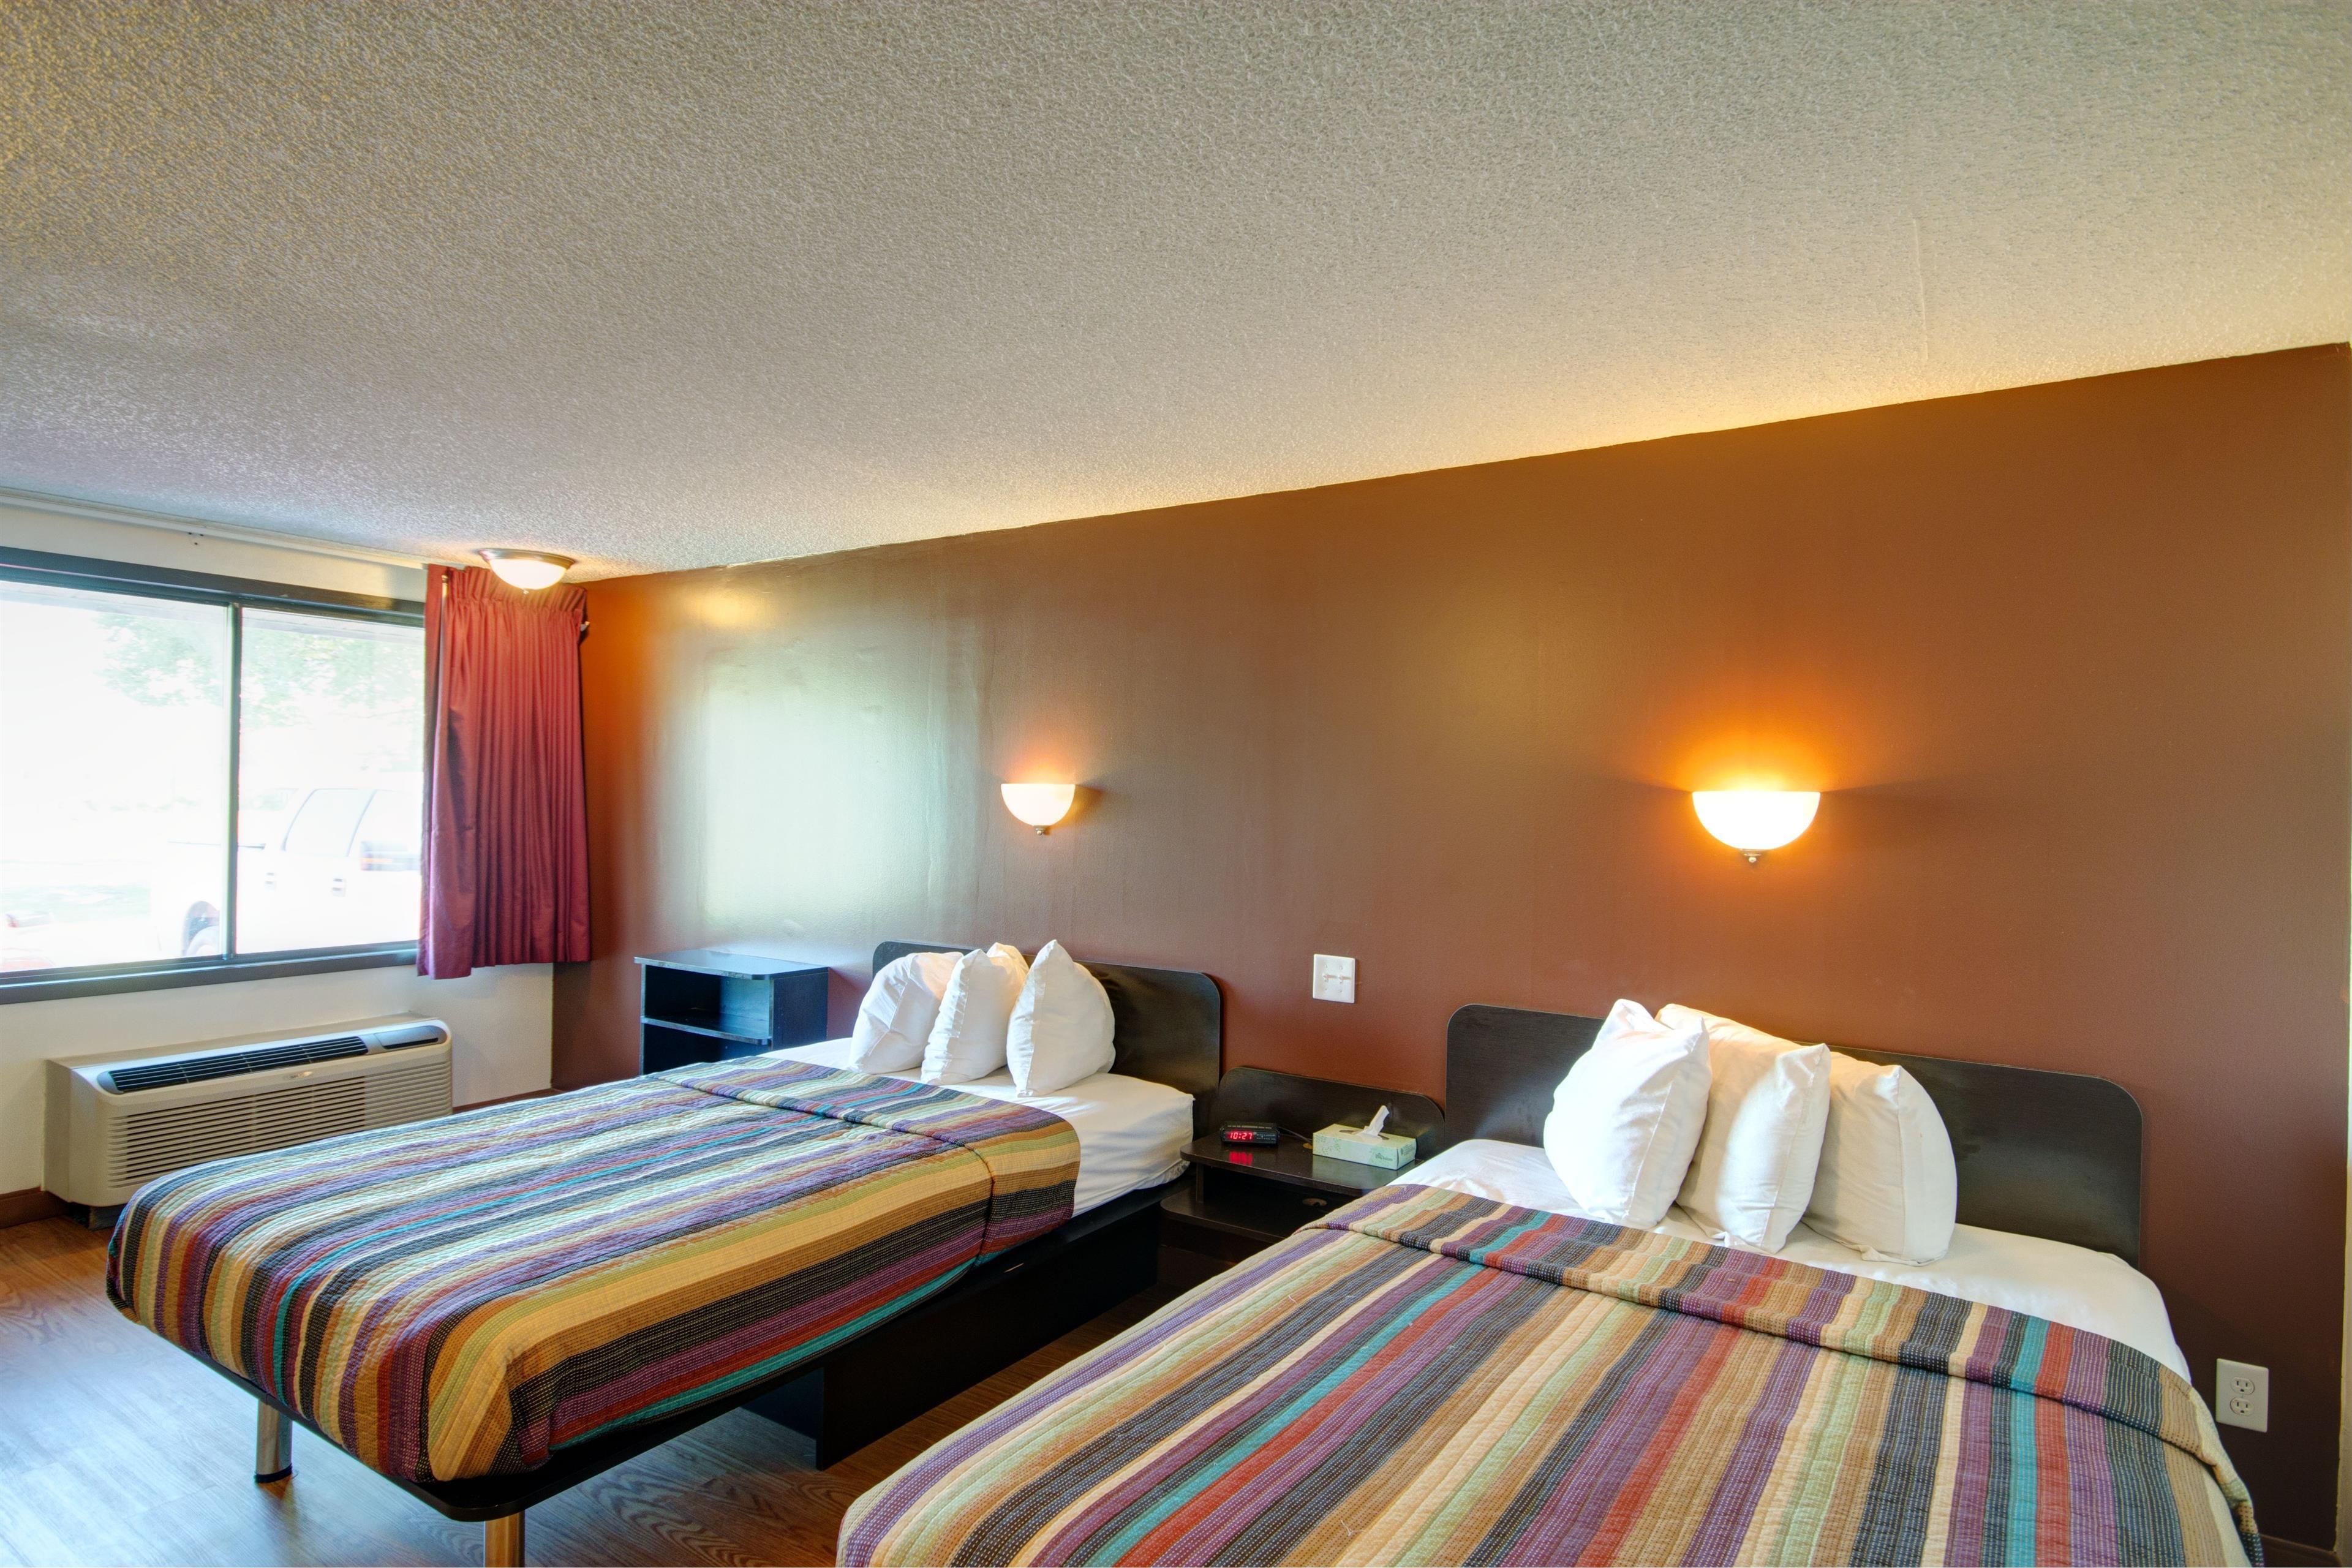 Americas Best Value Inn - Heath/Newark image 13